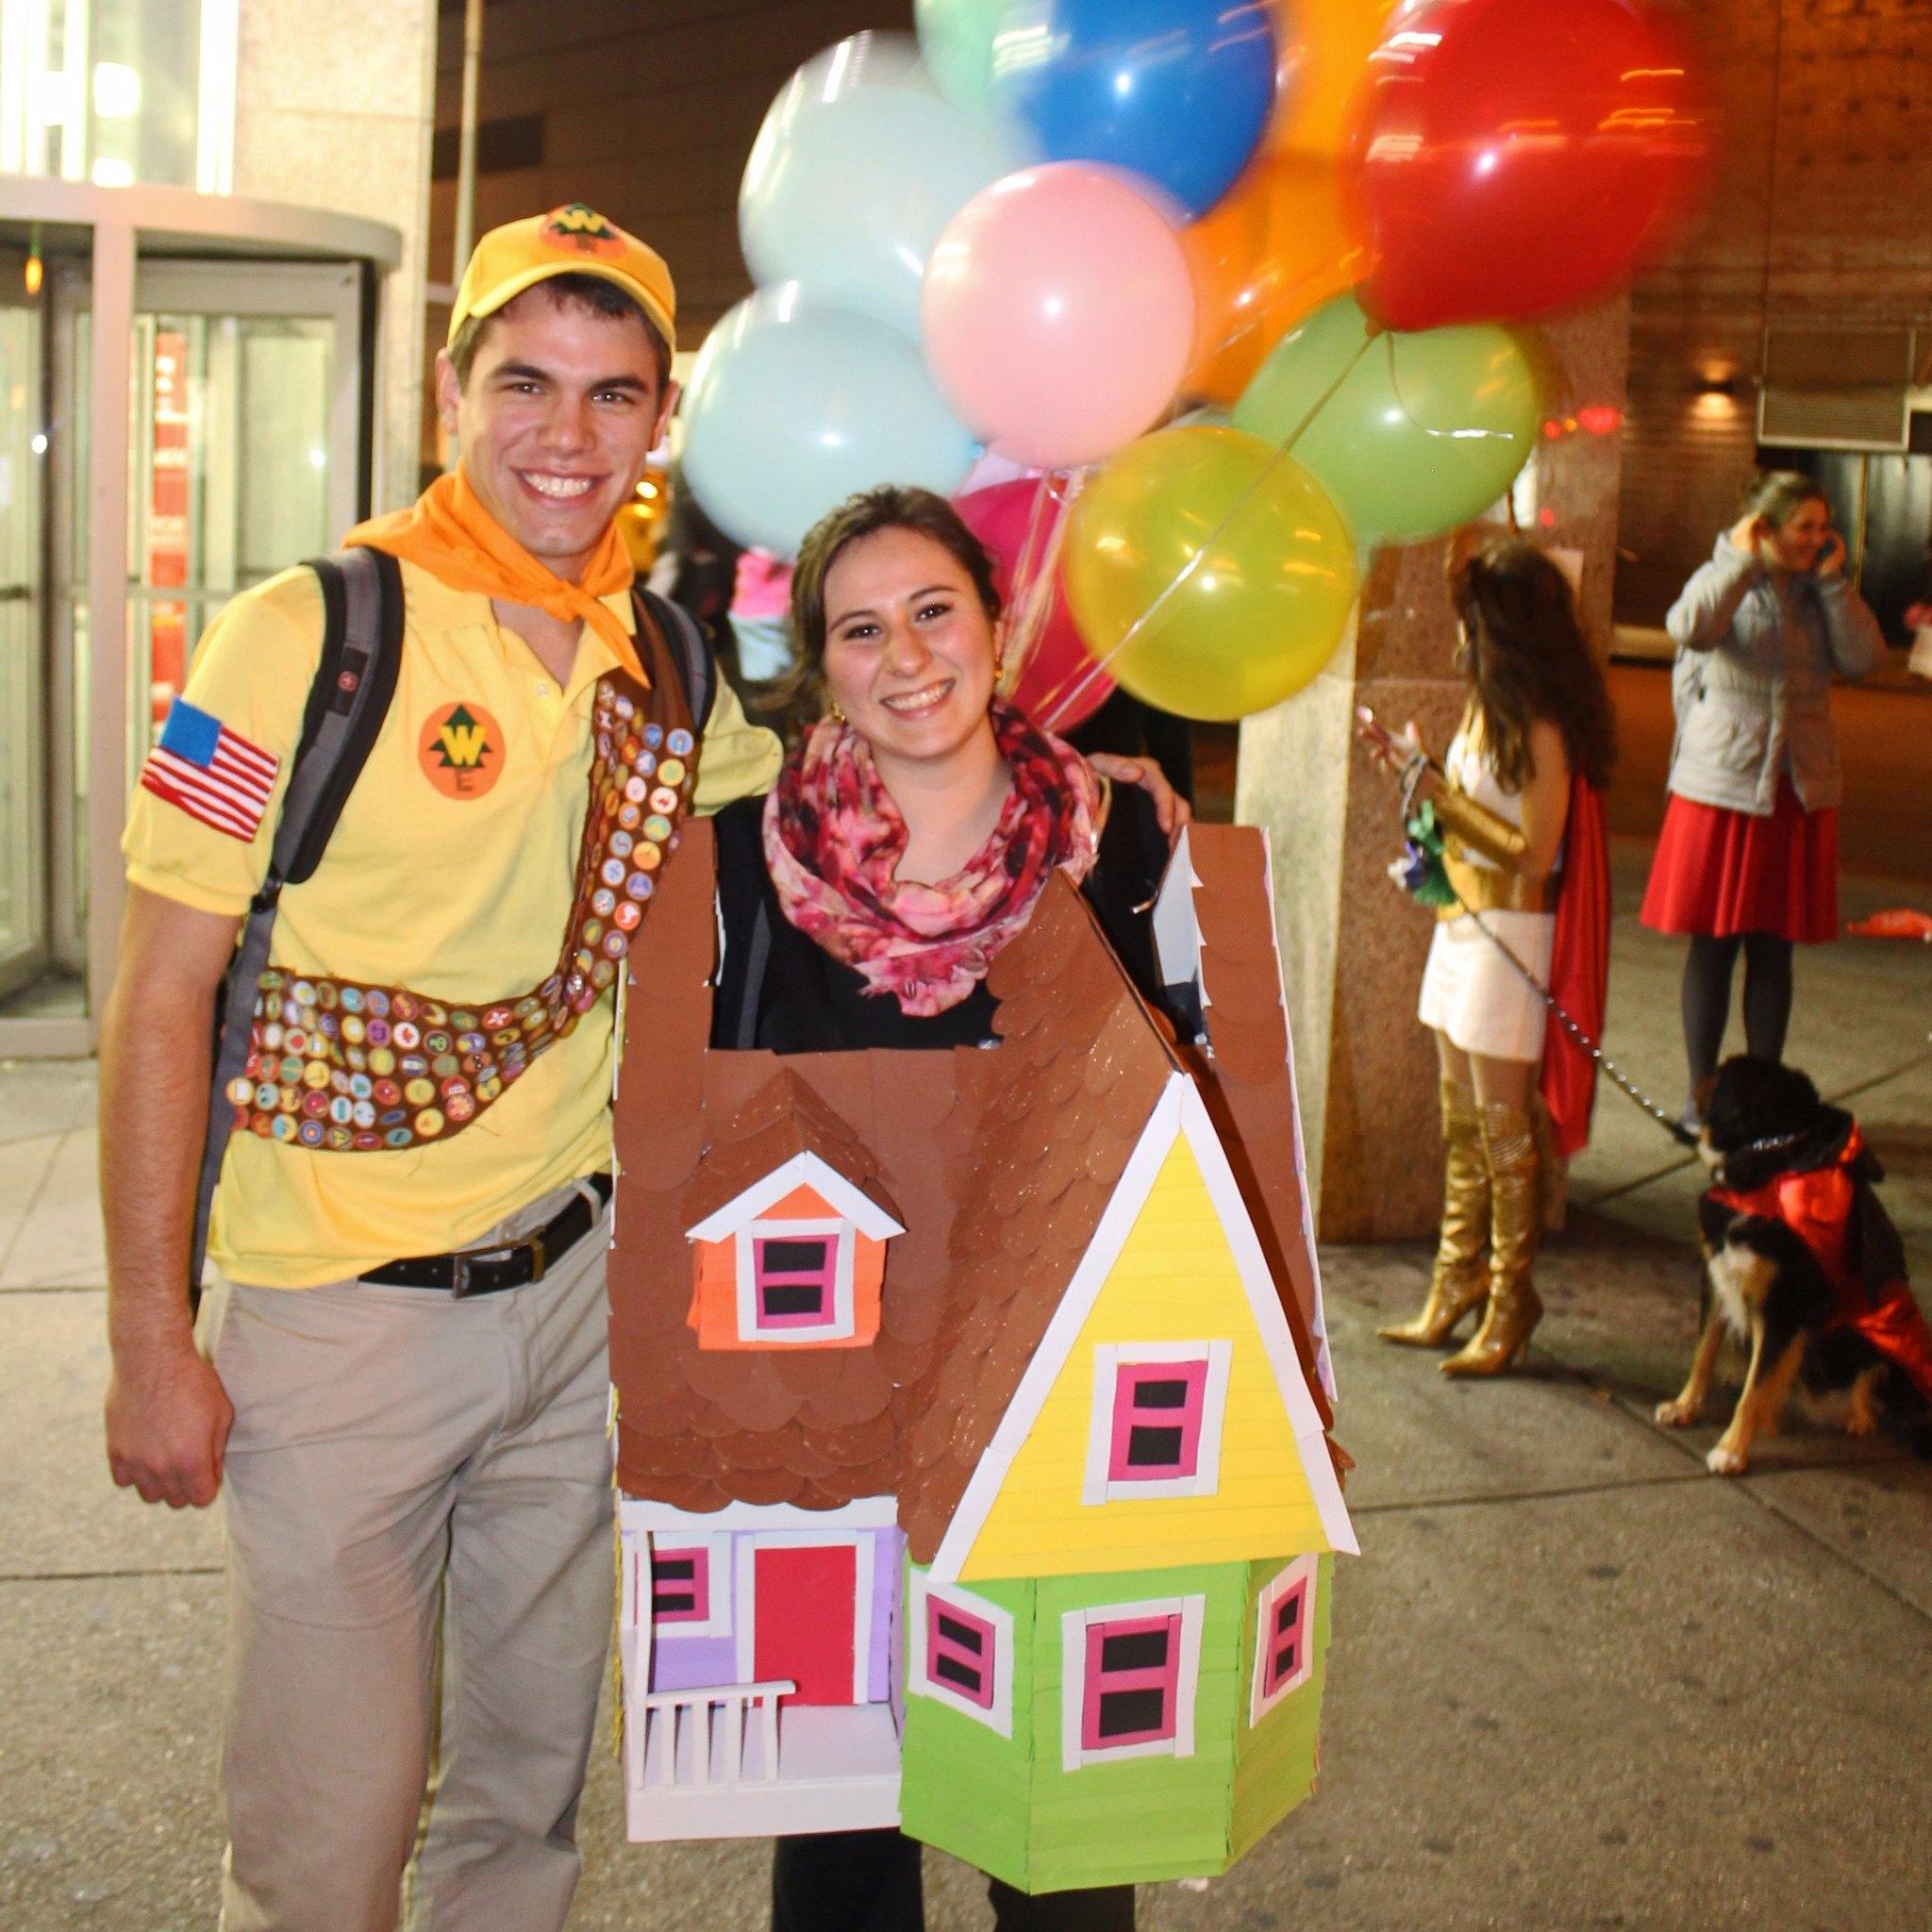 10 Famous Homemade Halloween Costume Ideas Couples cheap diy couples halloween costumes popsugar smart living 3 2020